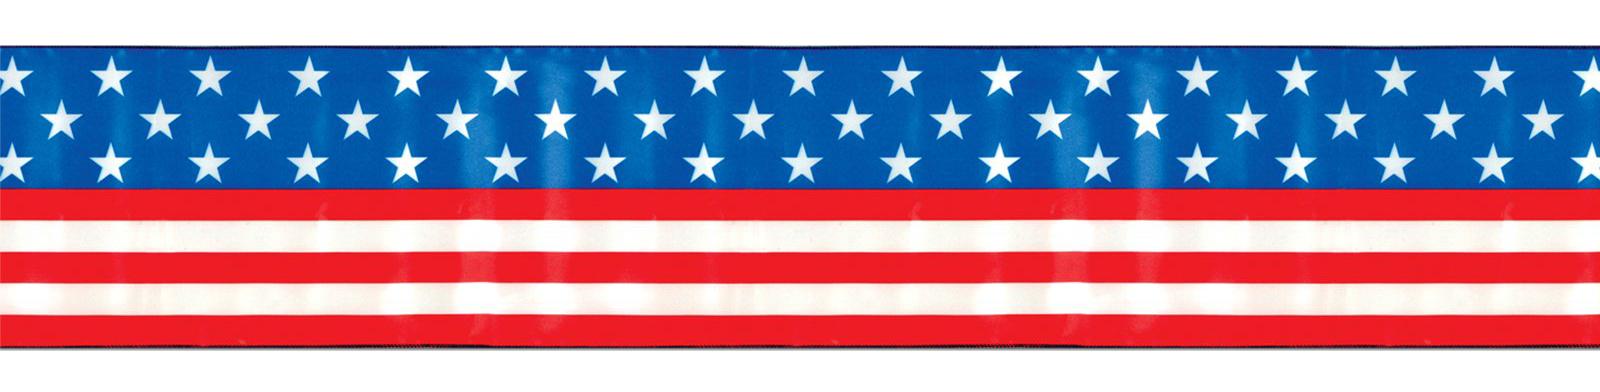 patriotic-banner-7